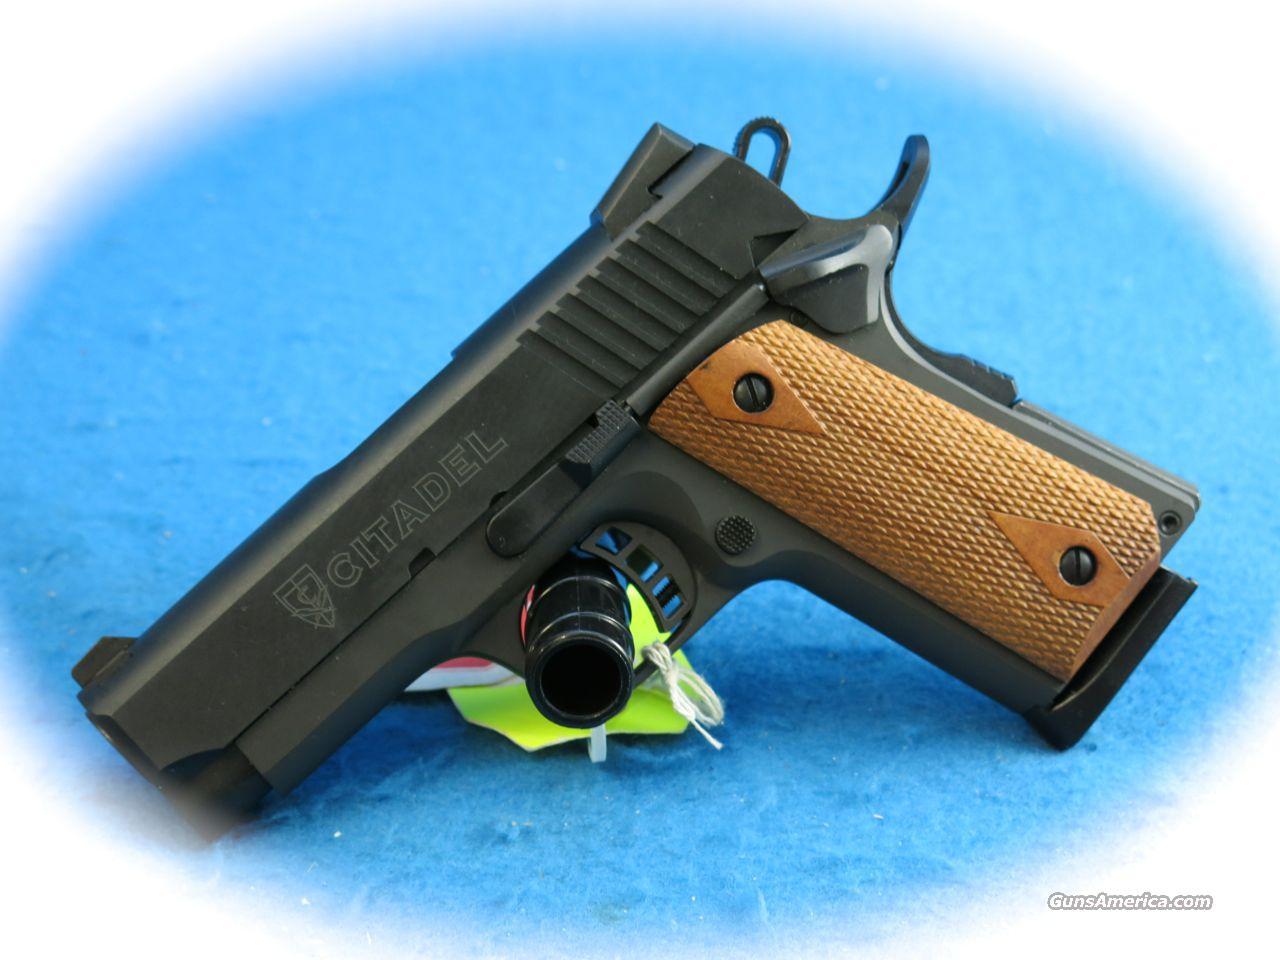 citadel 1911 compact 45 acp pistol new on for sale. Black Bedroom Furniture Sets. Home Design Ideas